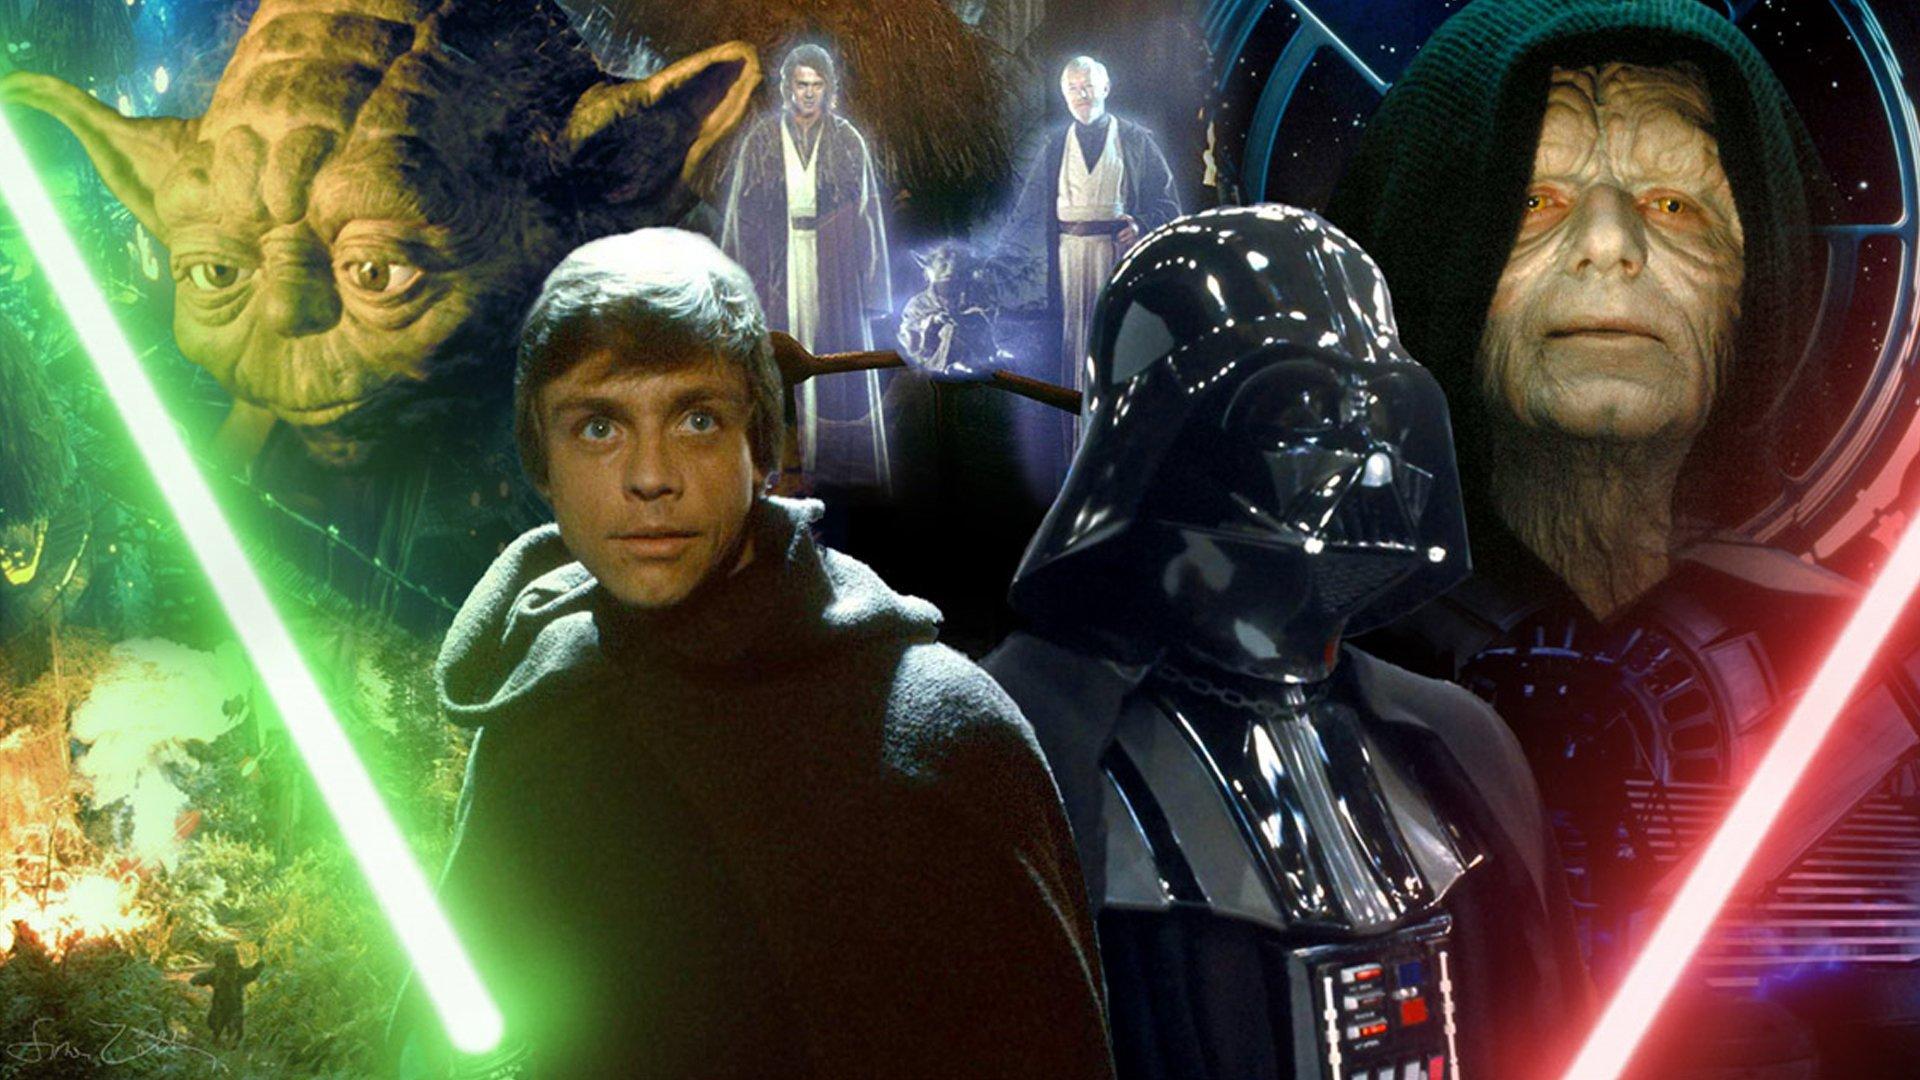 star wars episode vi: return of the jedi full hd wallpaper and